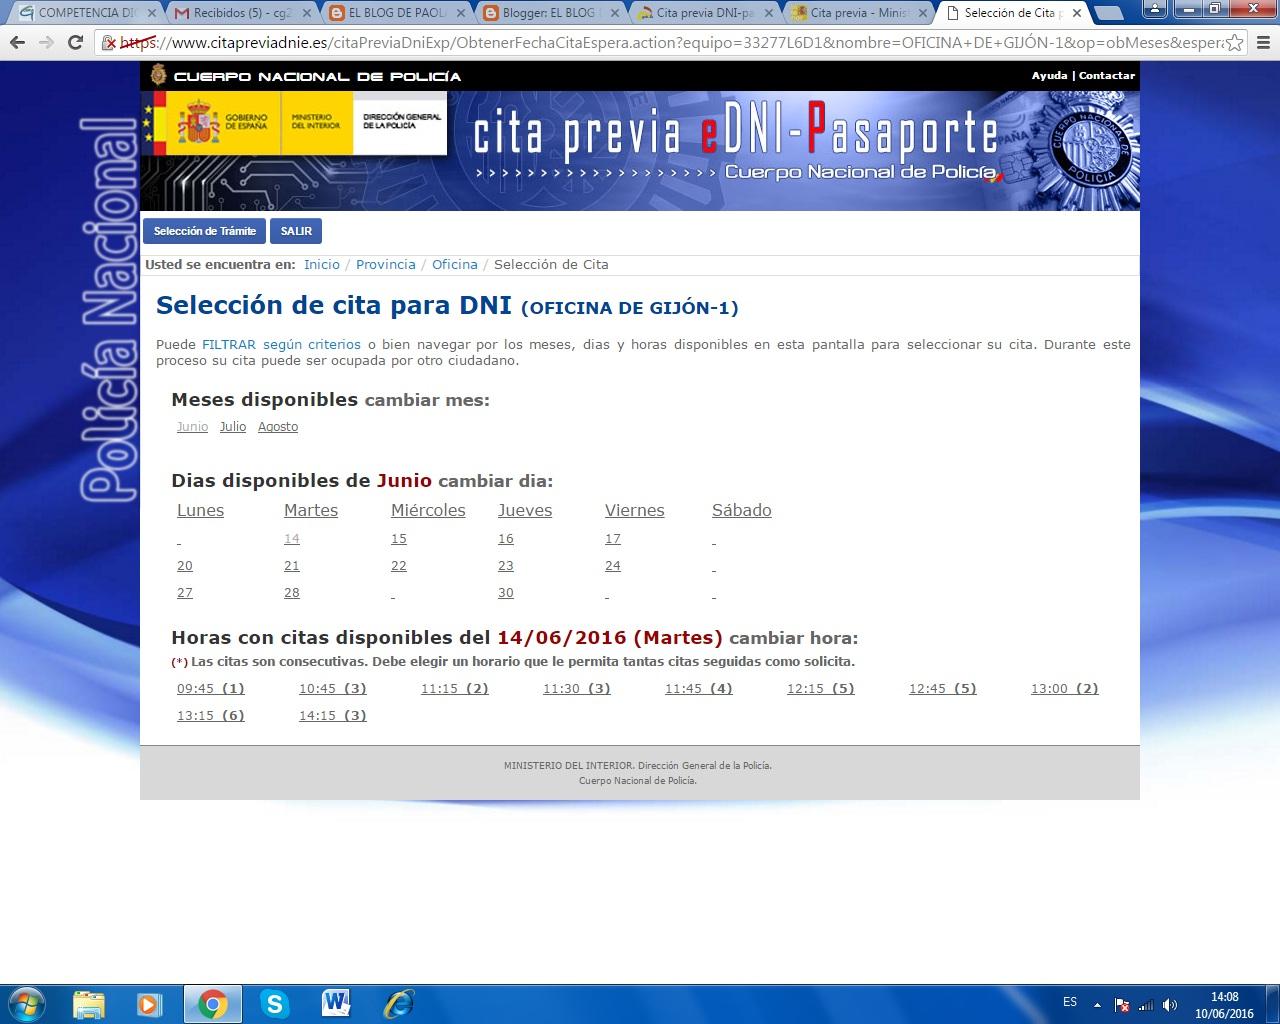 El blog de paola centeno 11 cita para renovar el dni - Ministerio del interior renovacion dni ...